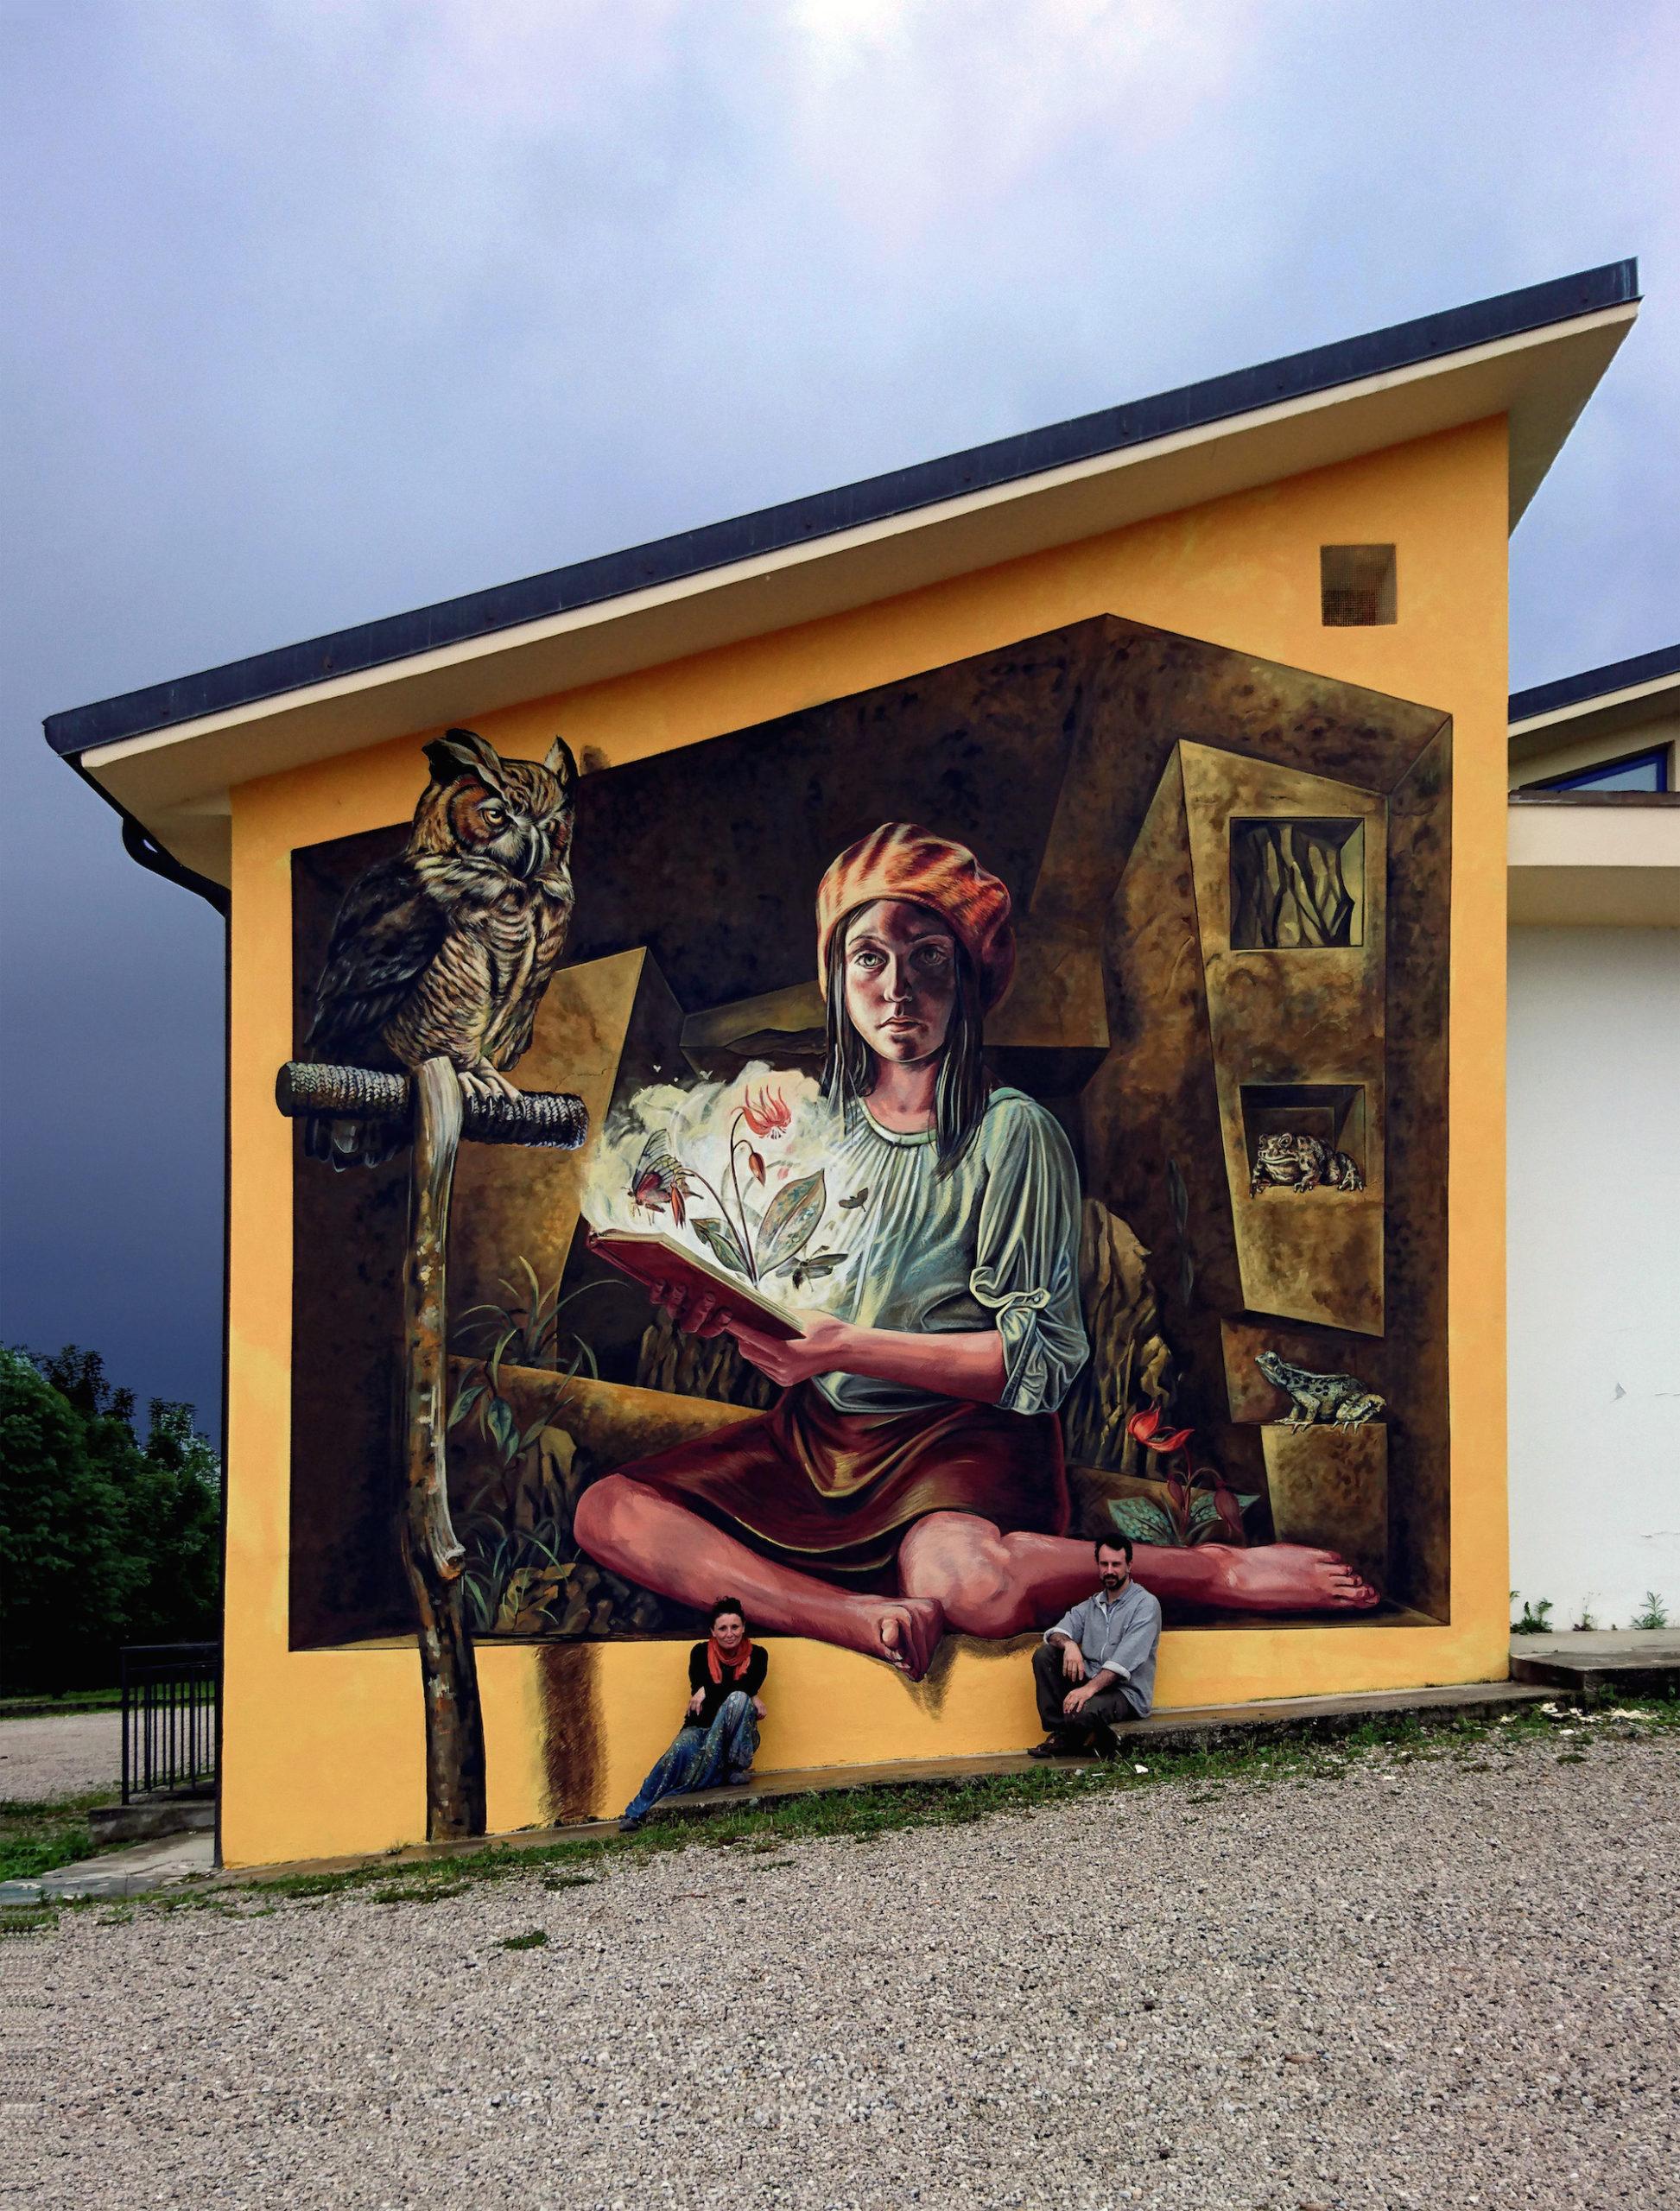 verabugatti streetart murals walls arteurbana illusioniottiche 3Dstreetart gufo natura bergonze streetartvicenza start rana rospo natura lettura zugliano